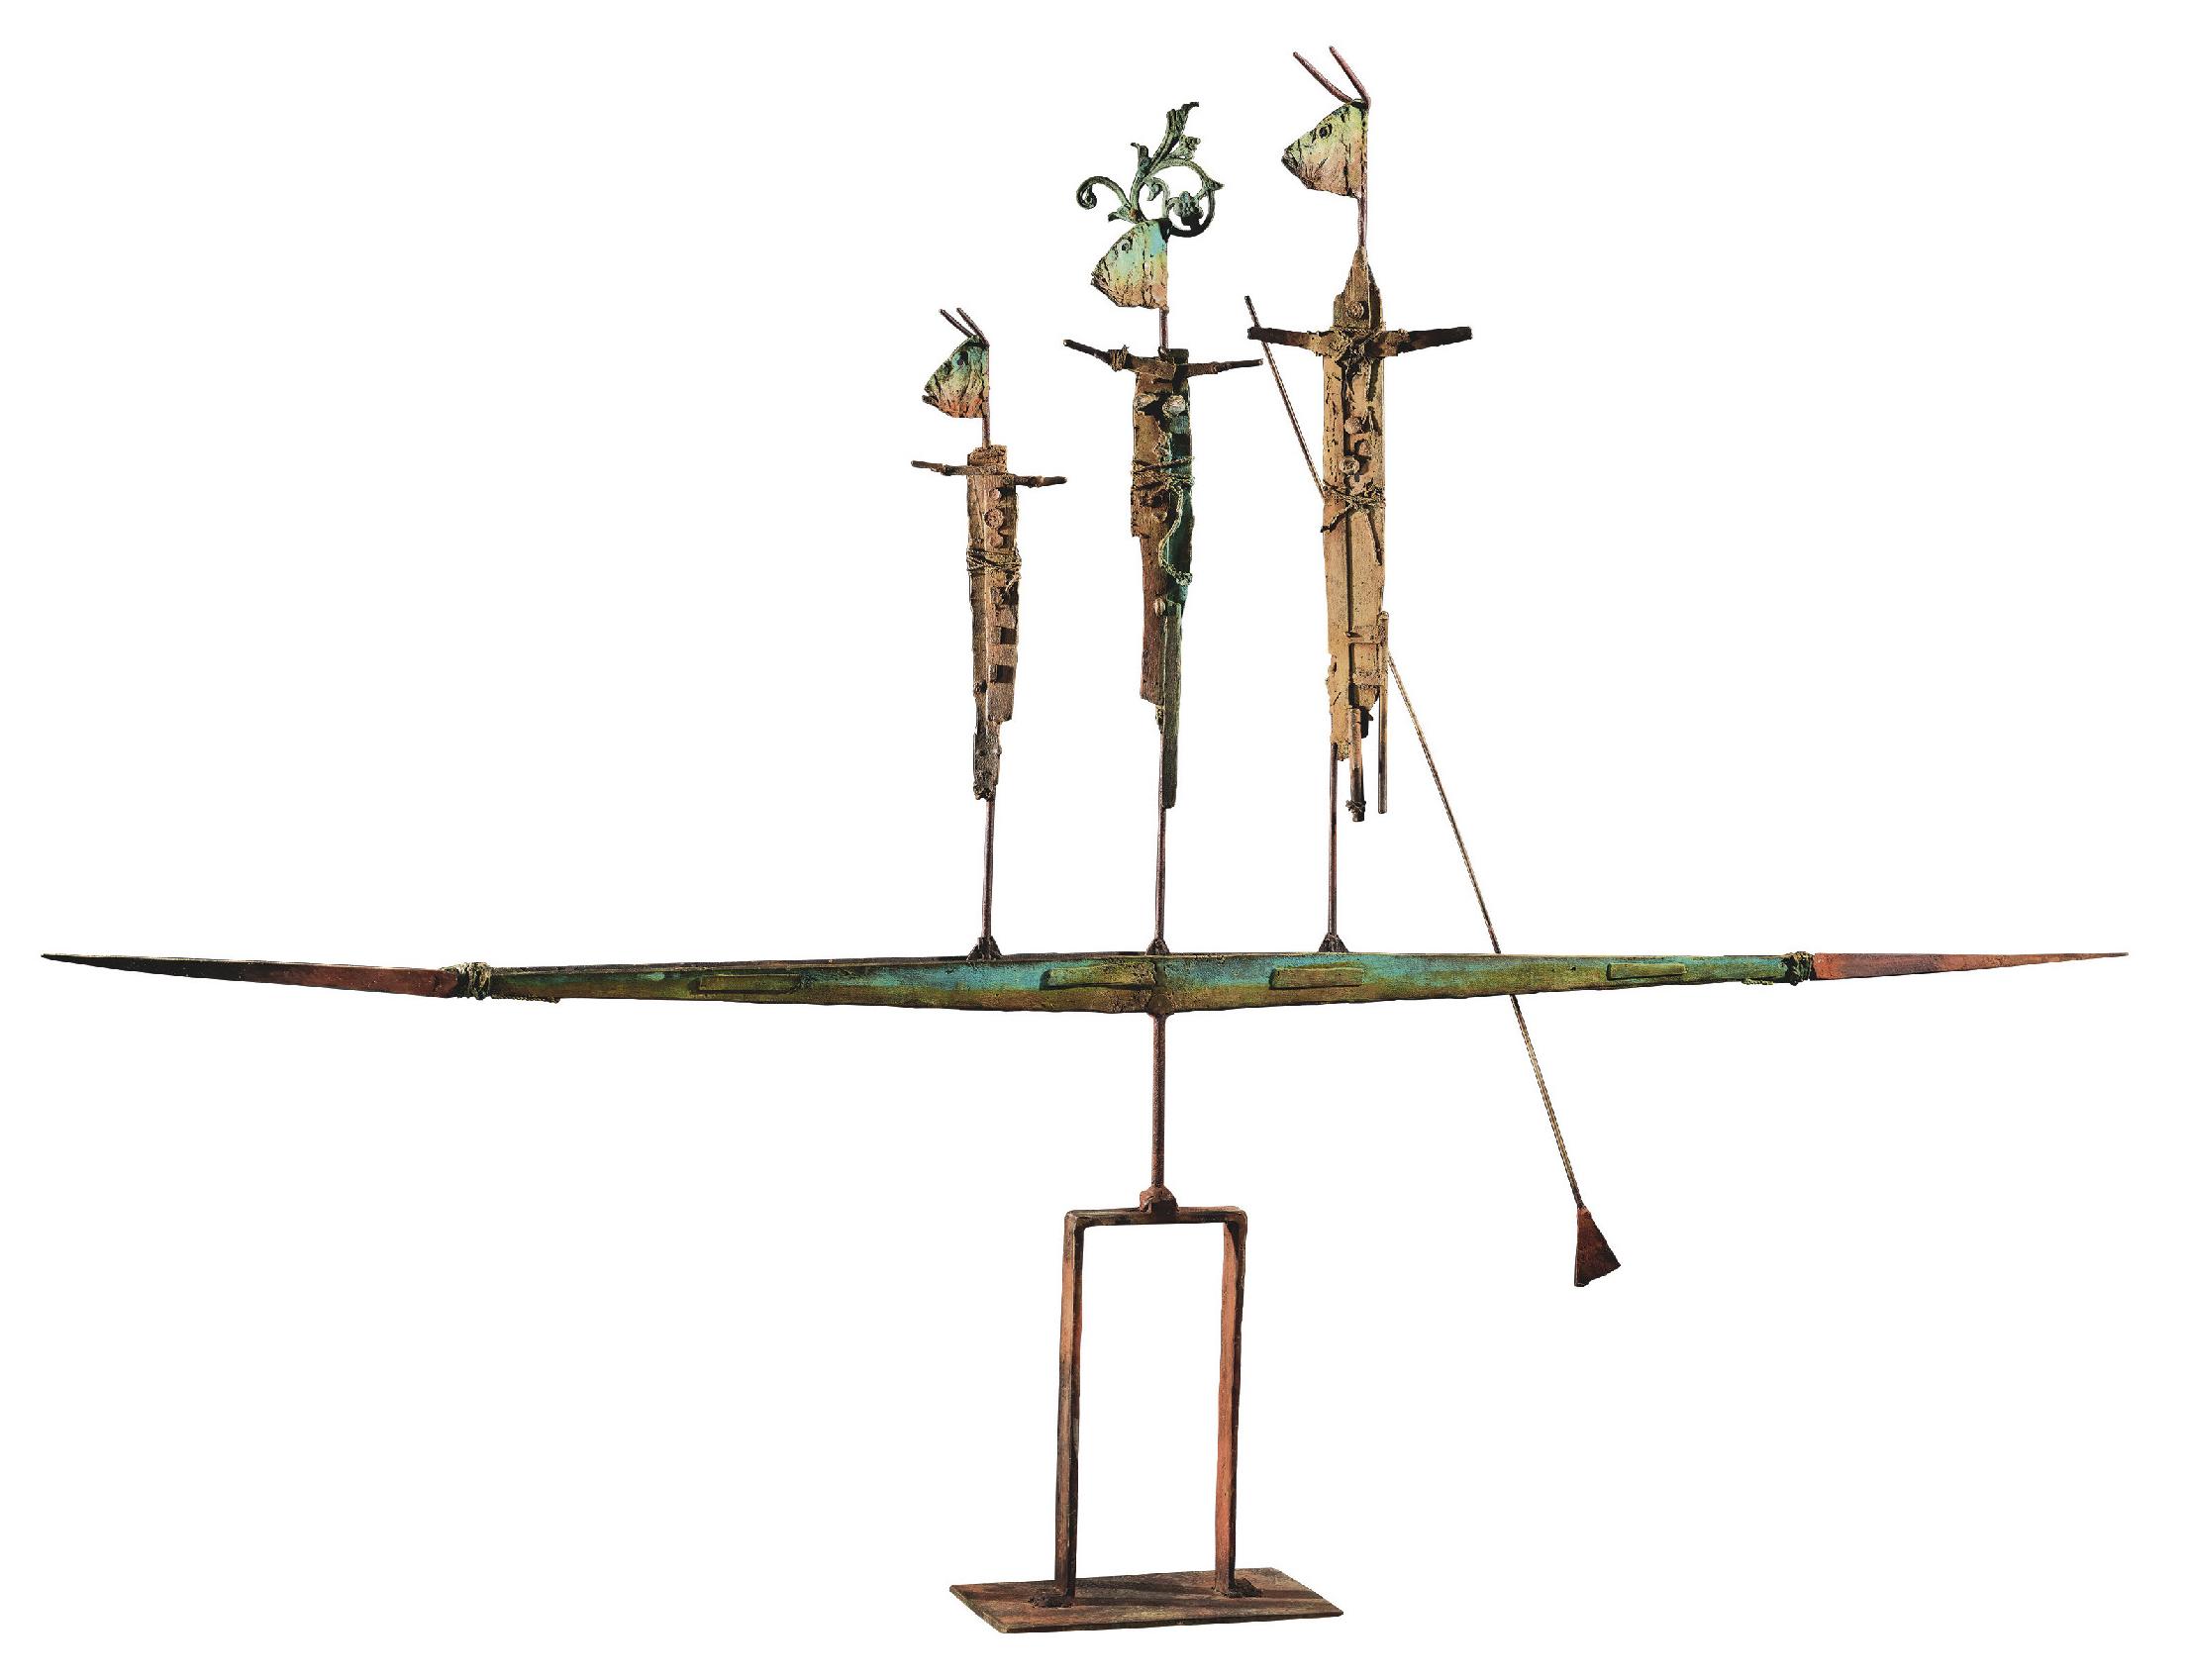 Lot 29 - Giorgi Claude (1954) Pirogue, 2018 - Bronze - H. 131 cm L. 180 cm l. 18 cm -